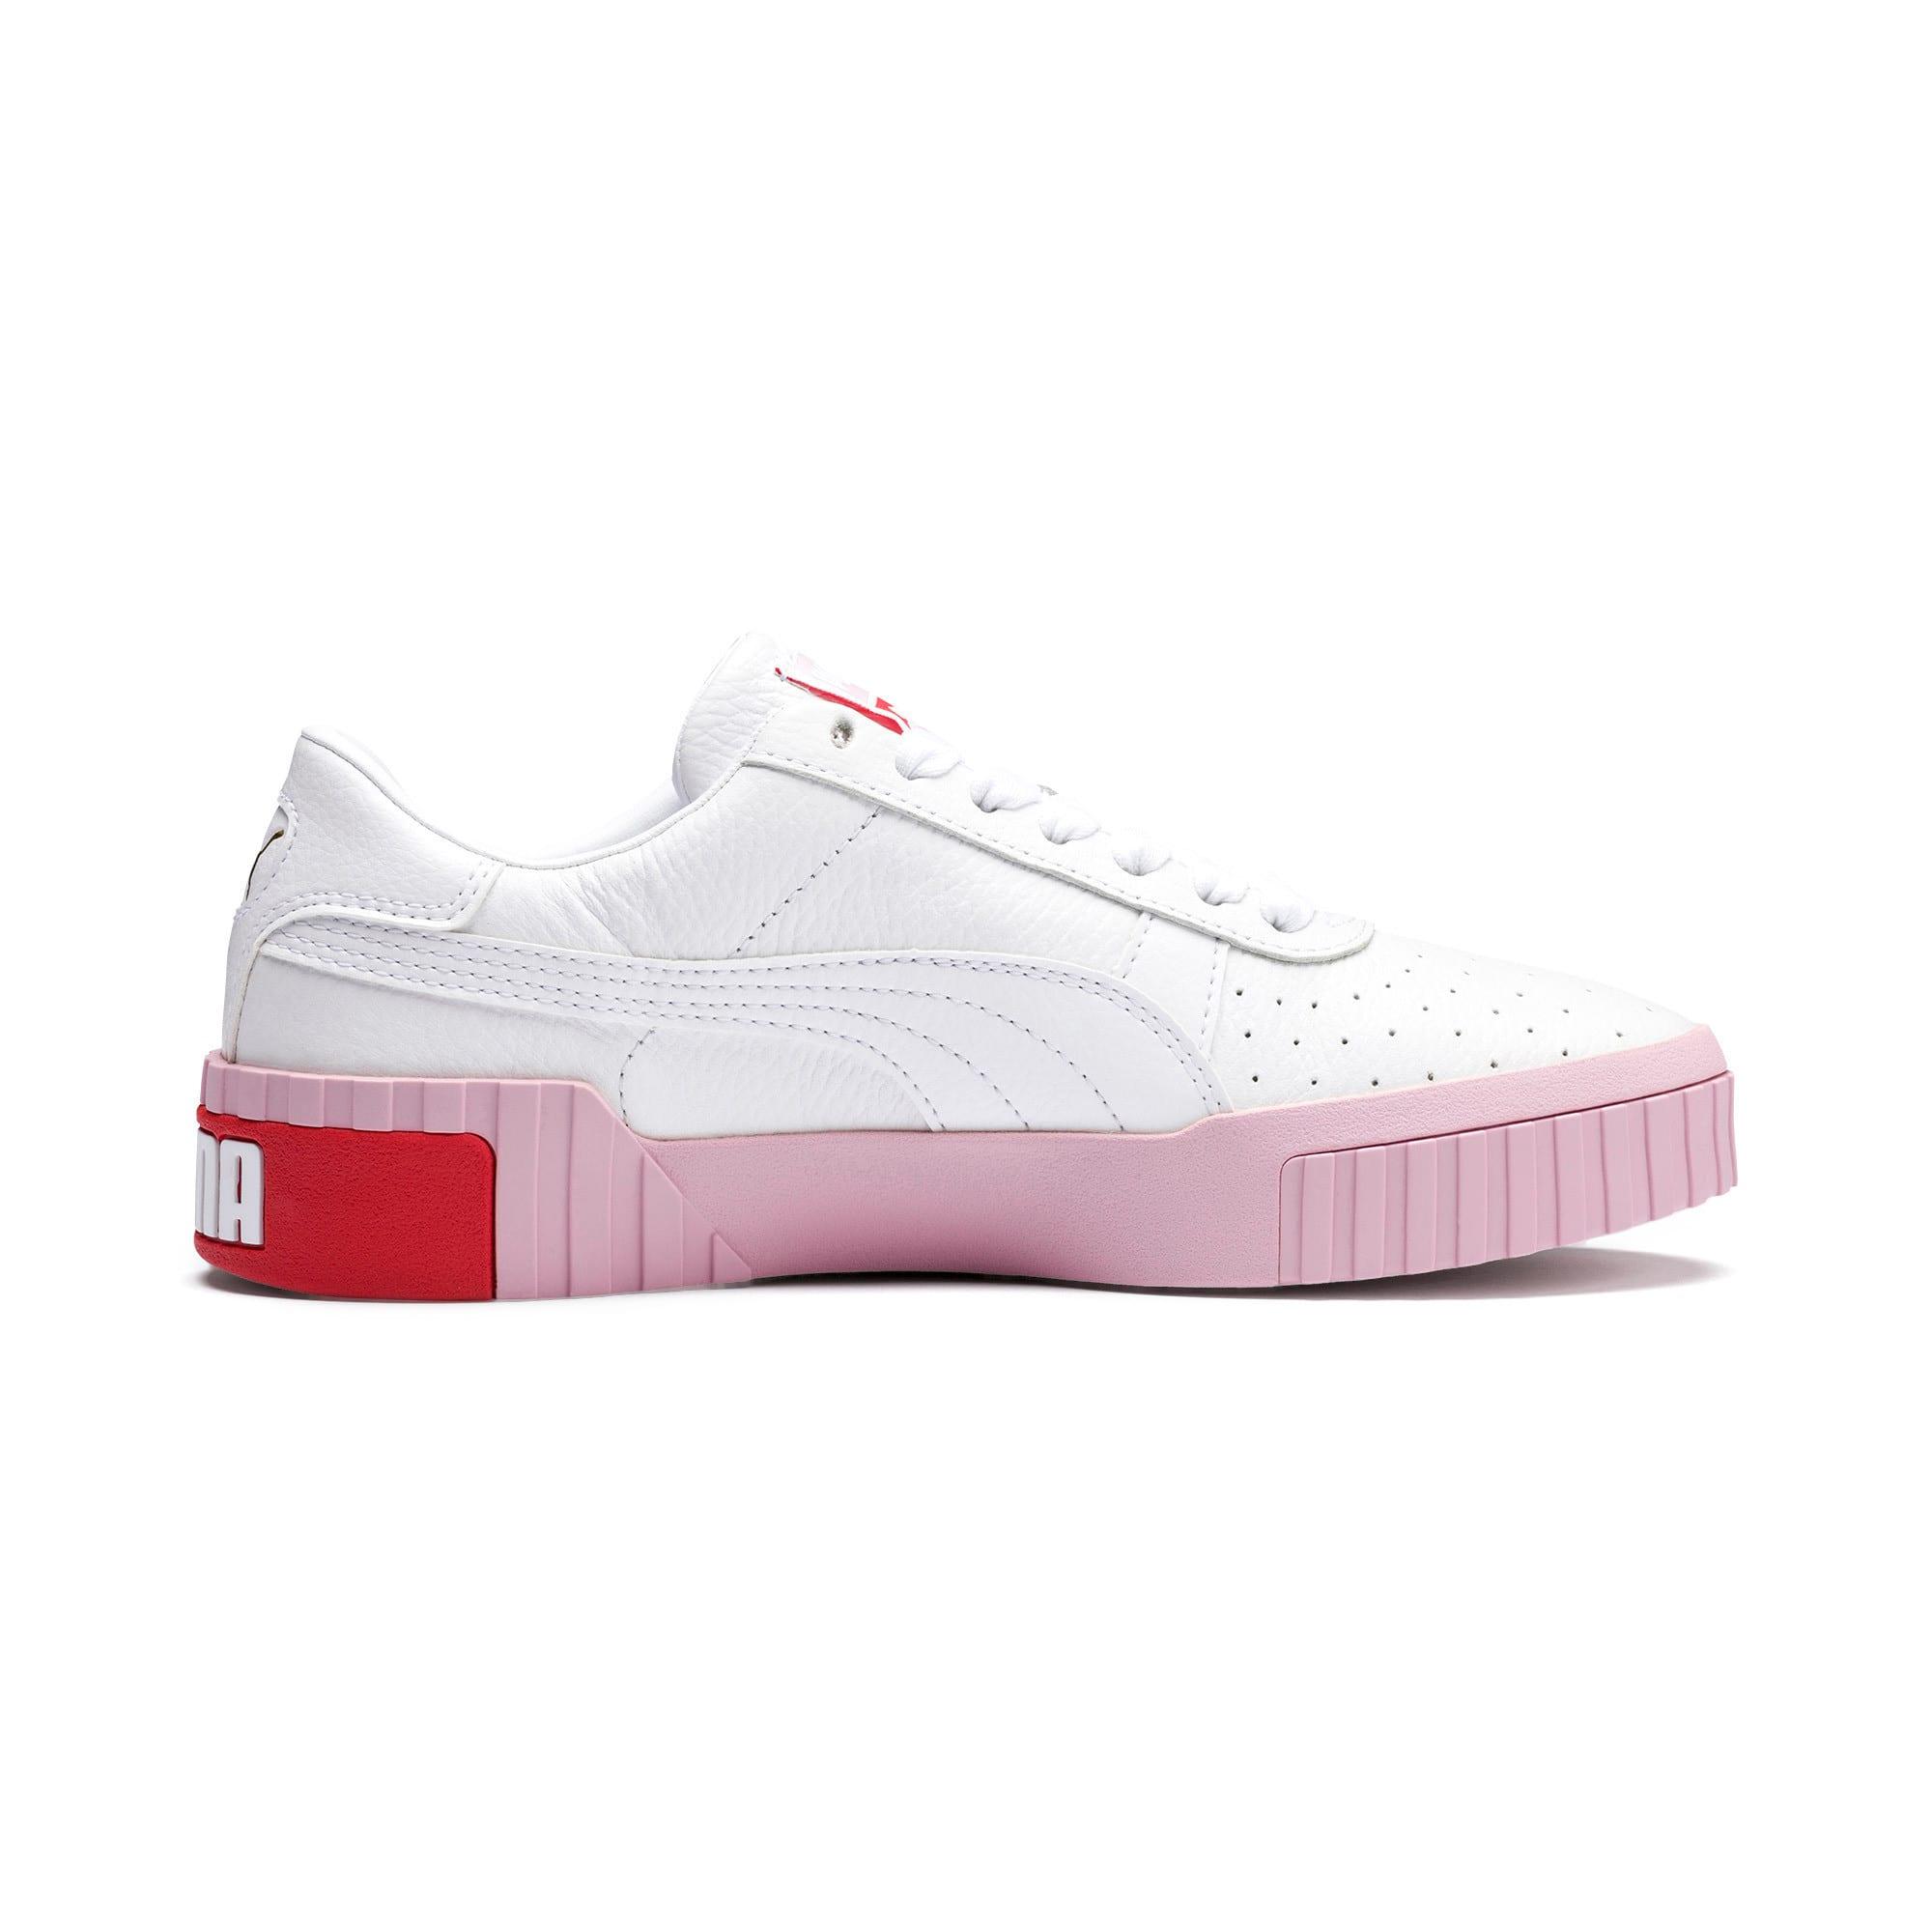 Thumbnail 6 of Basket Cali pour femme, Puma White-Pale Pink, medium